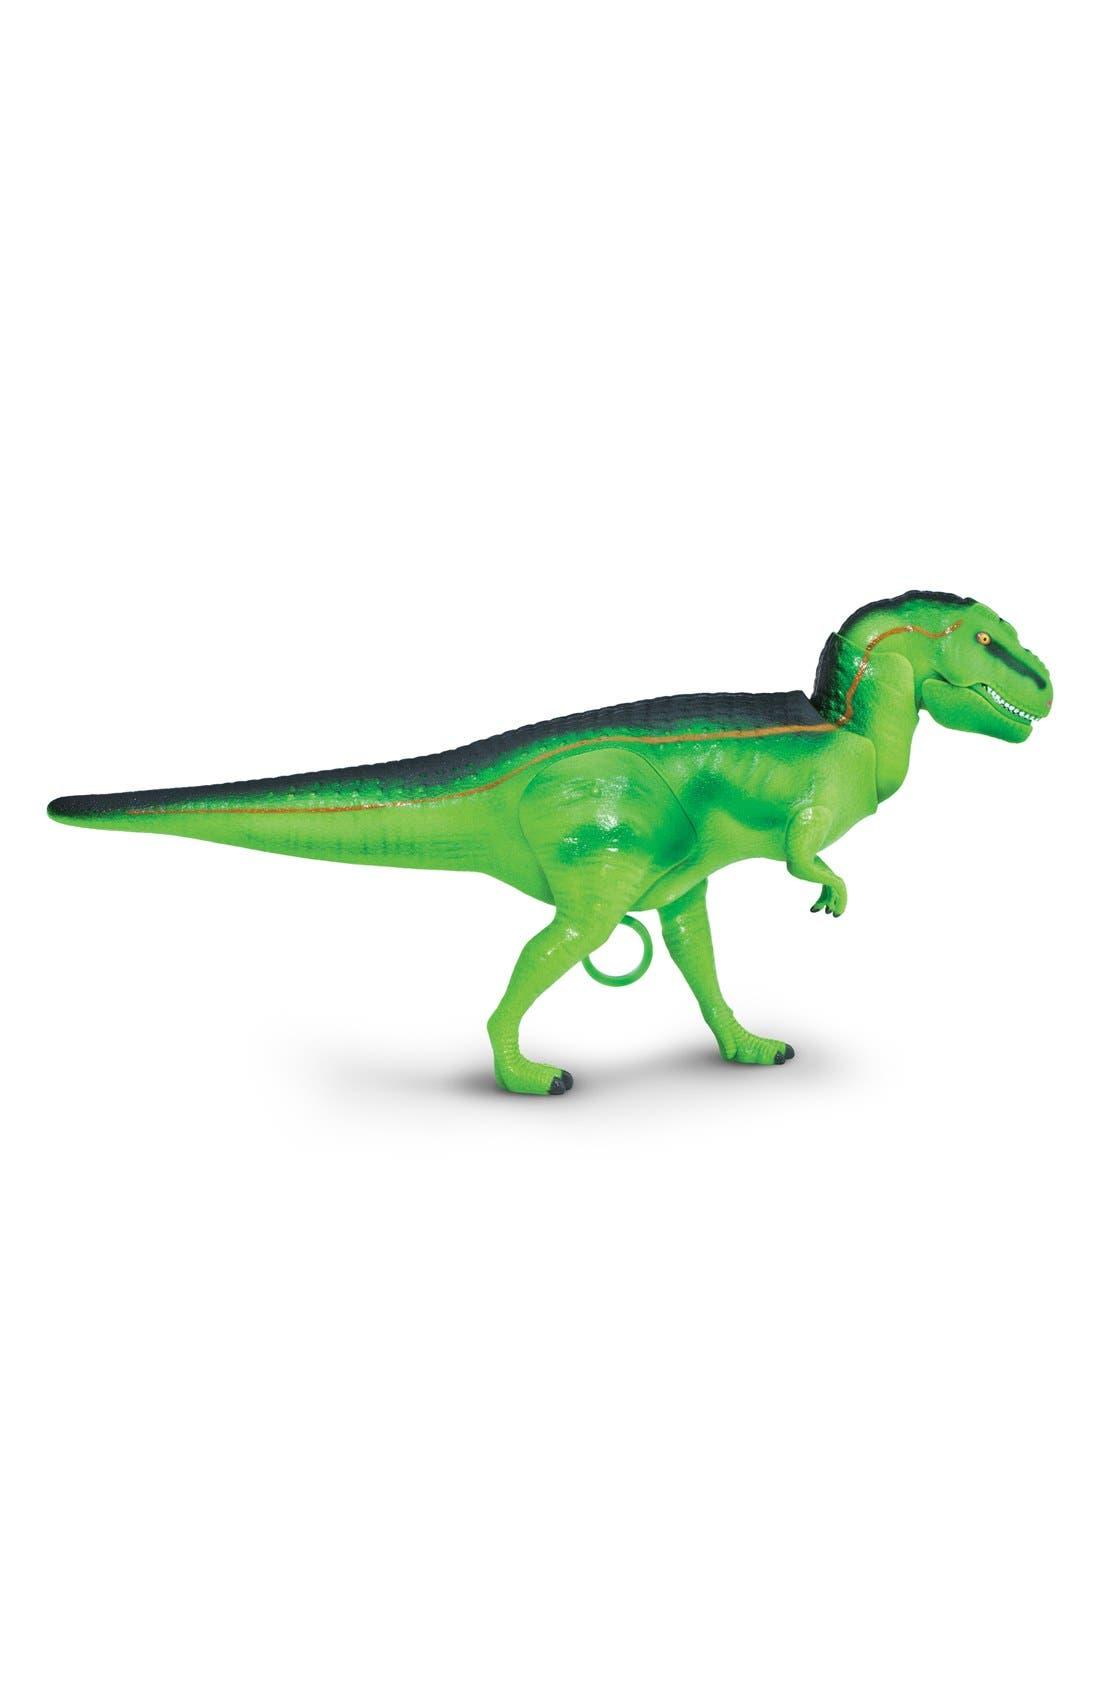 Main Image - Safari Ltd. Jaw Snapping Tyrannosaurus Rex Dinosaur Figurine